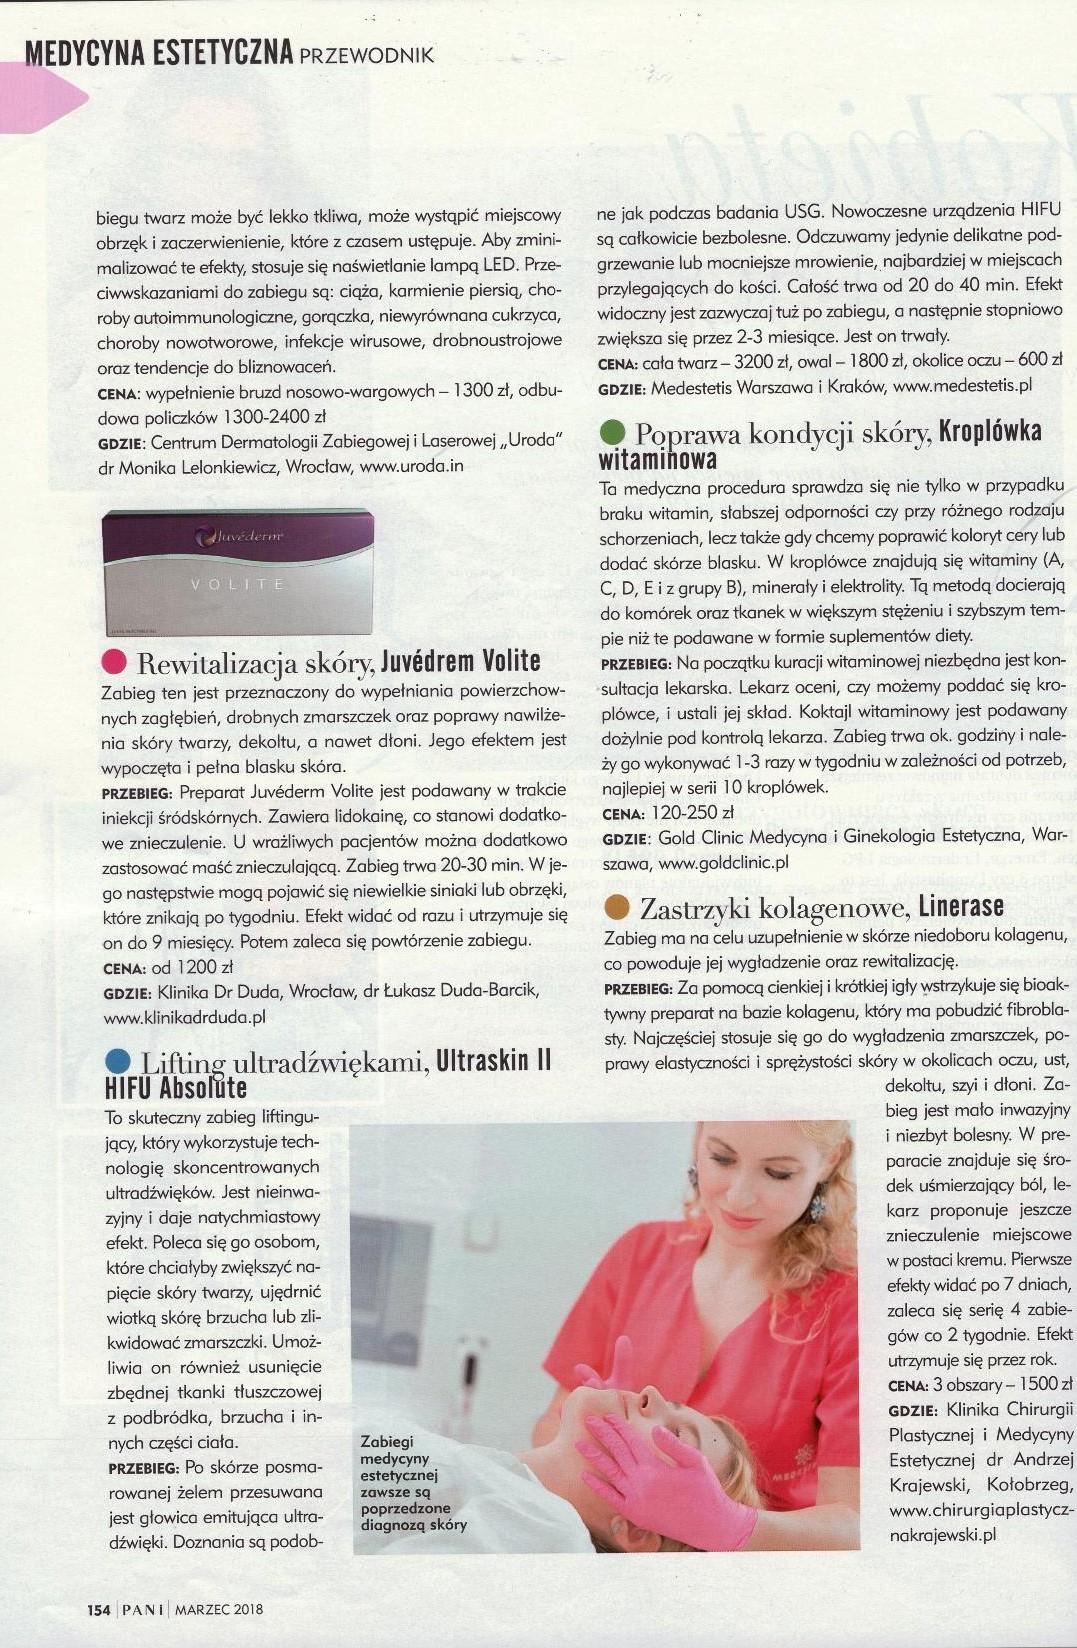 pani_marzec2018-page-002